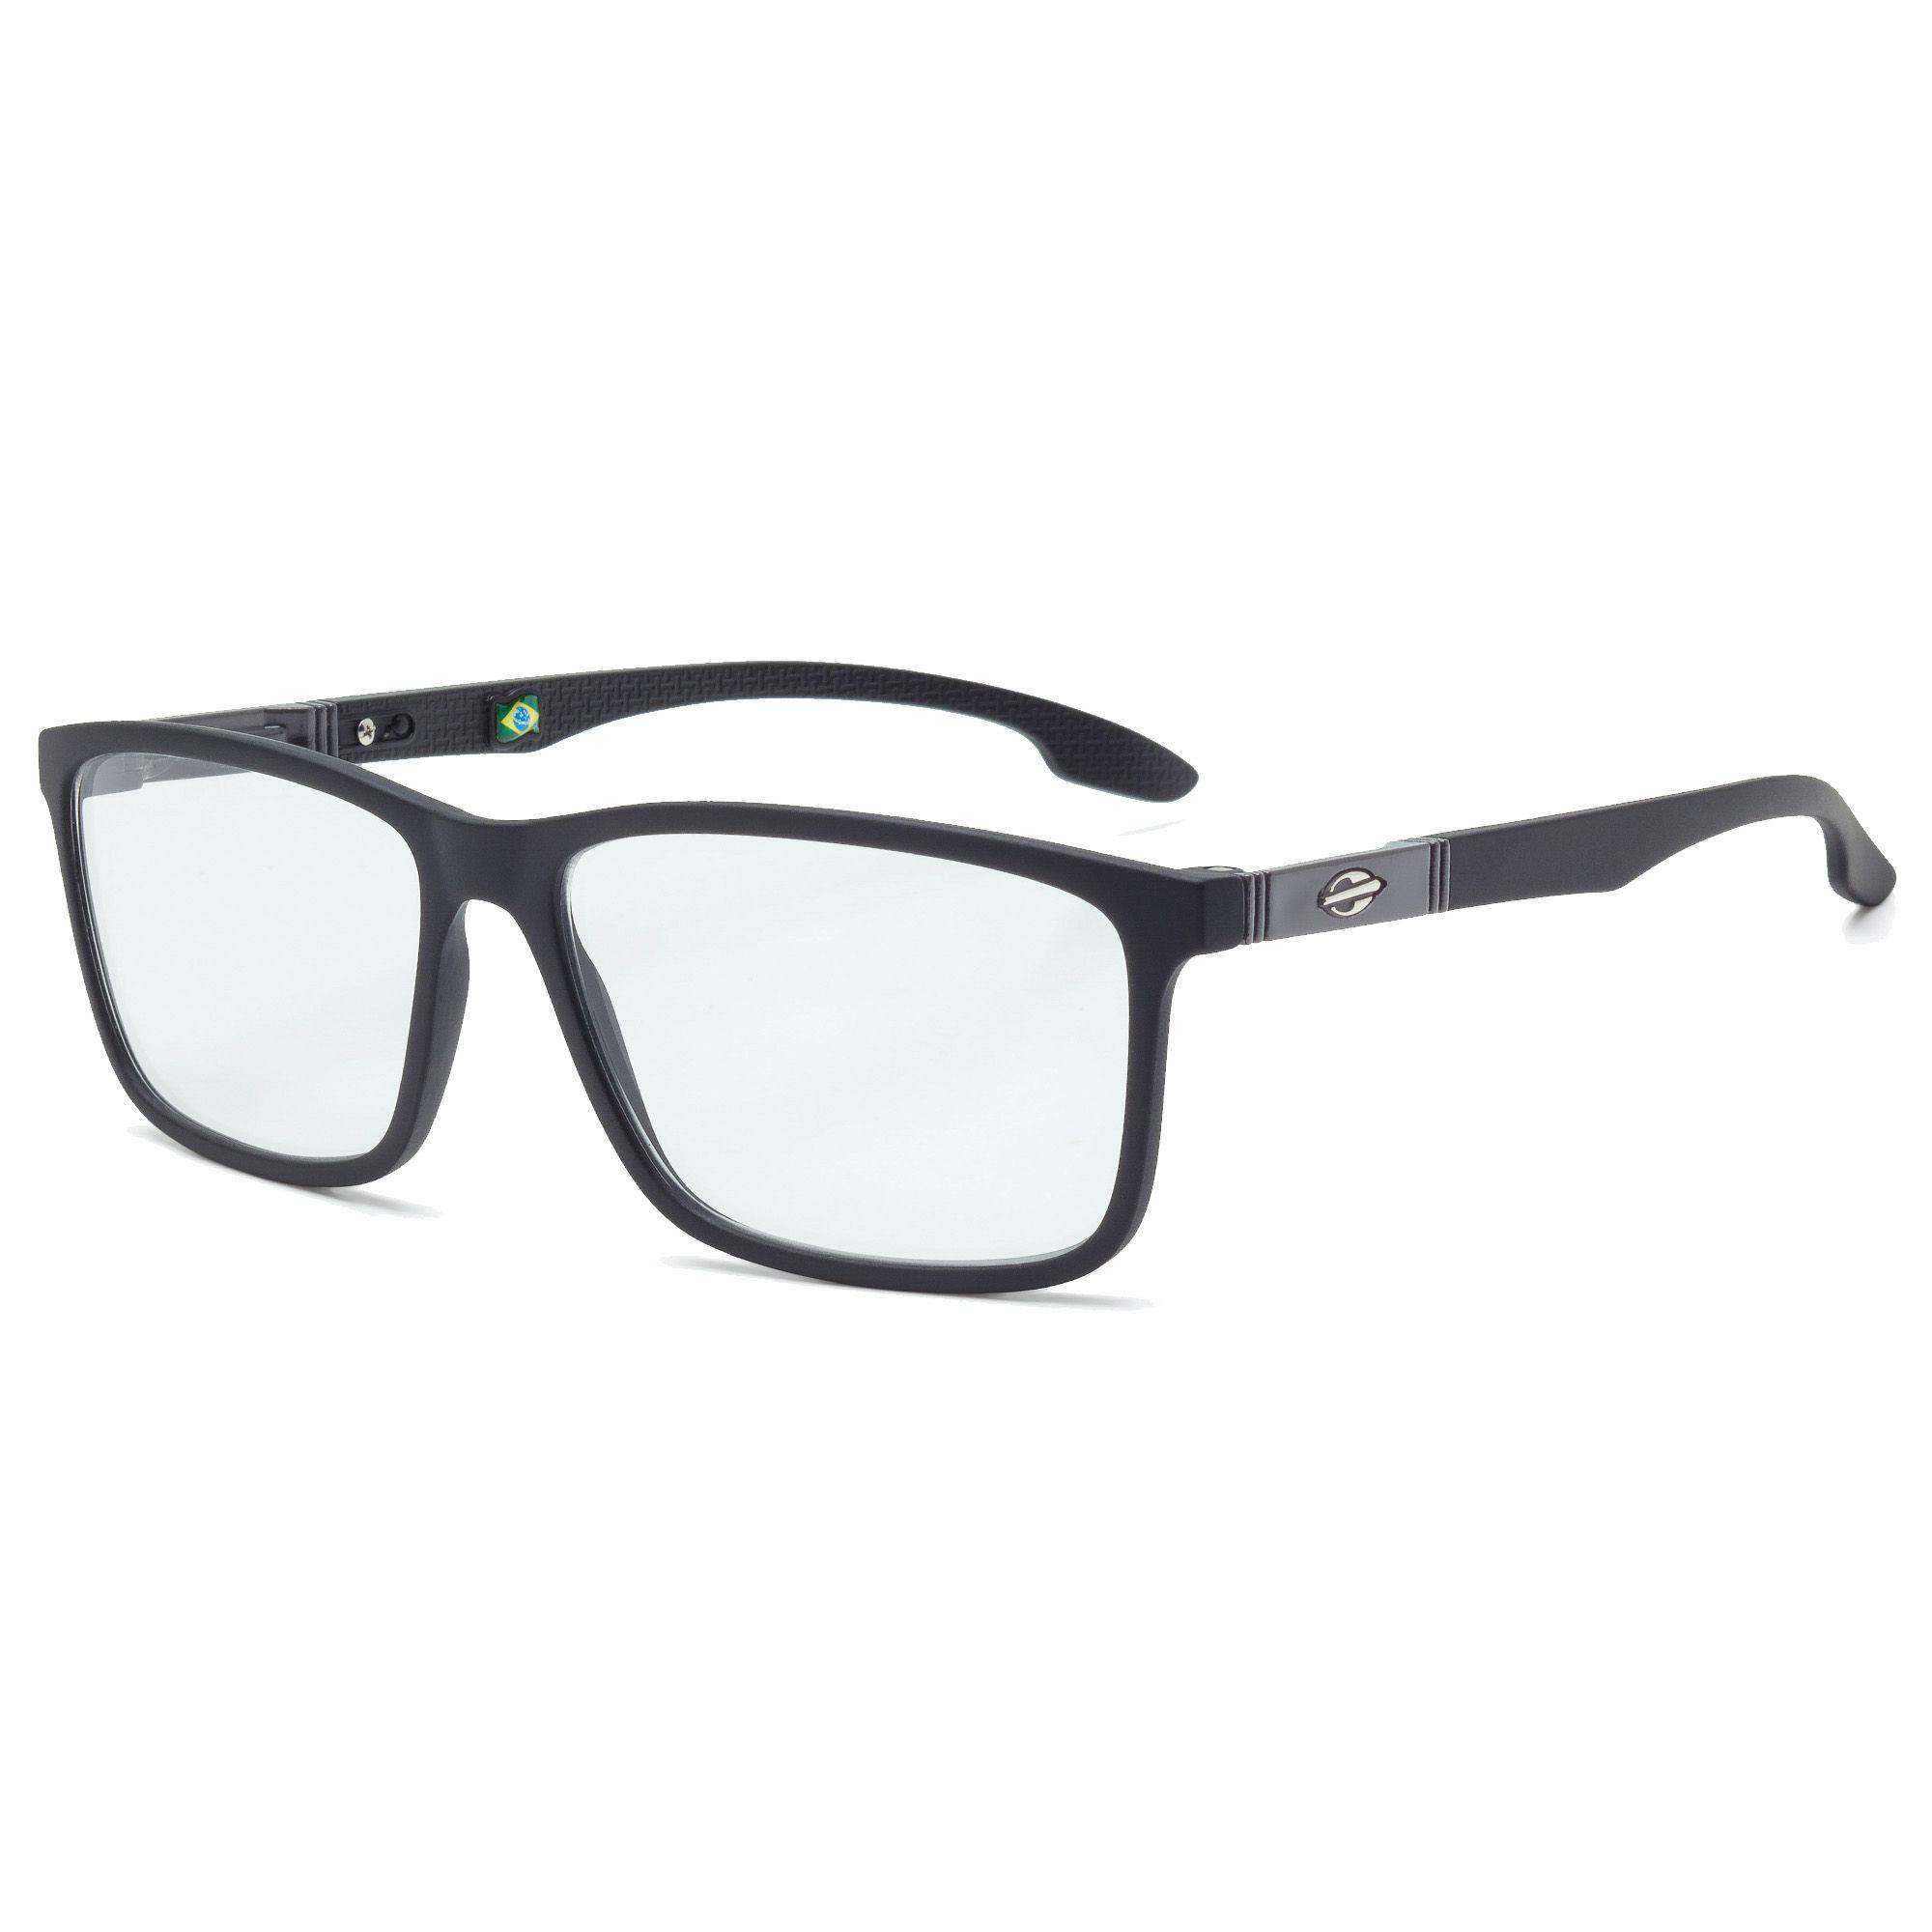 Óculos de Grau Unissex Mormaii Prana M6044ABV55